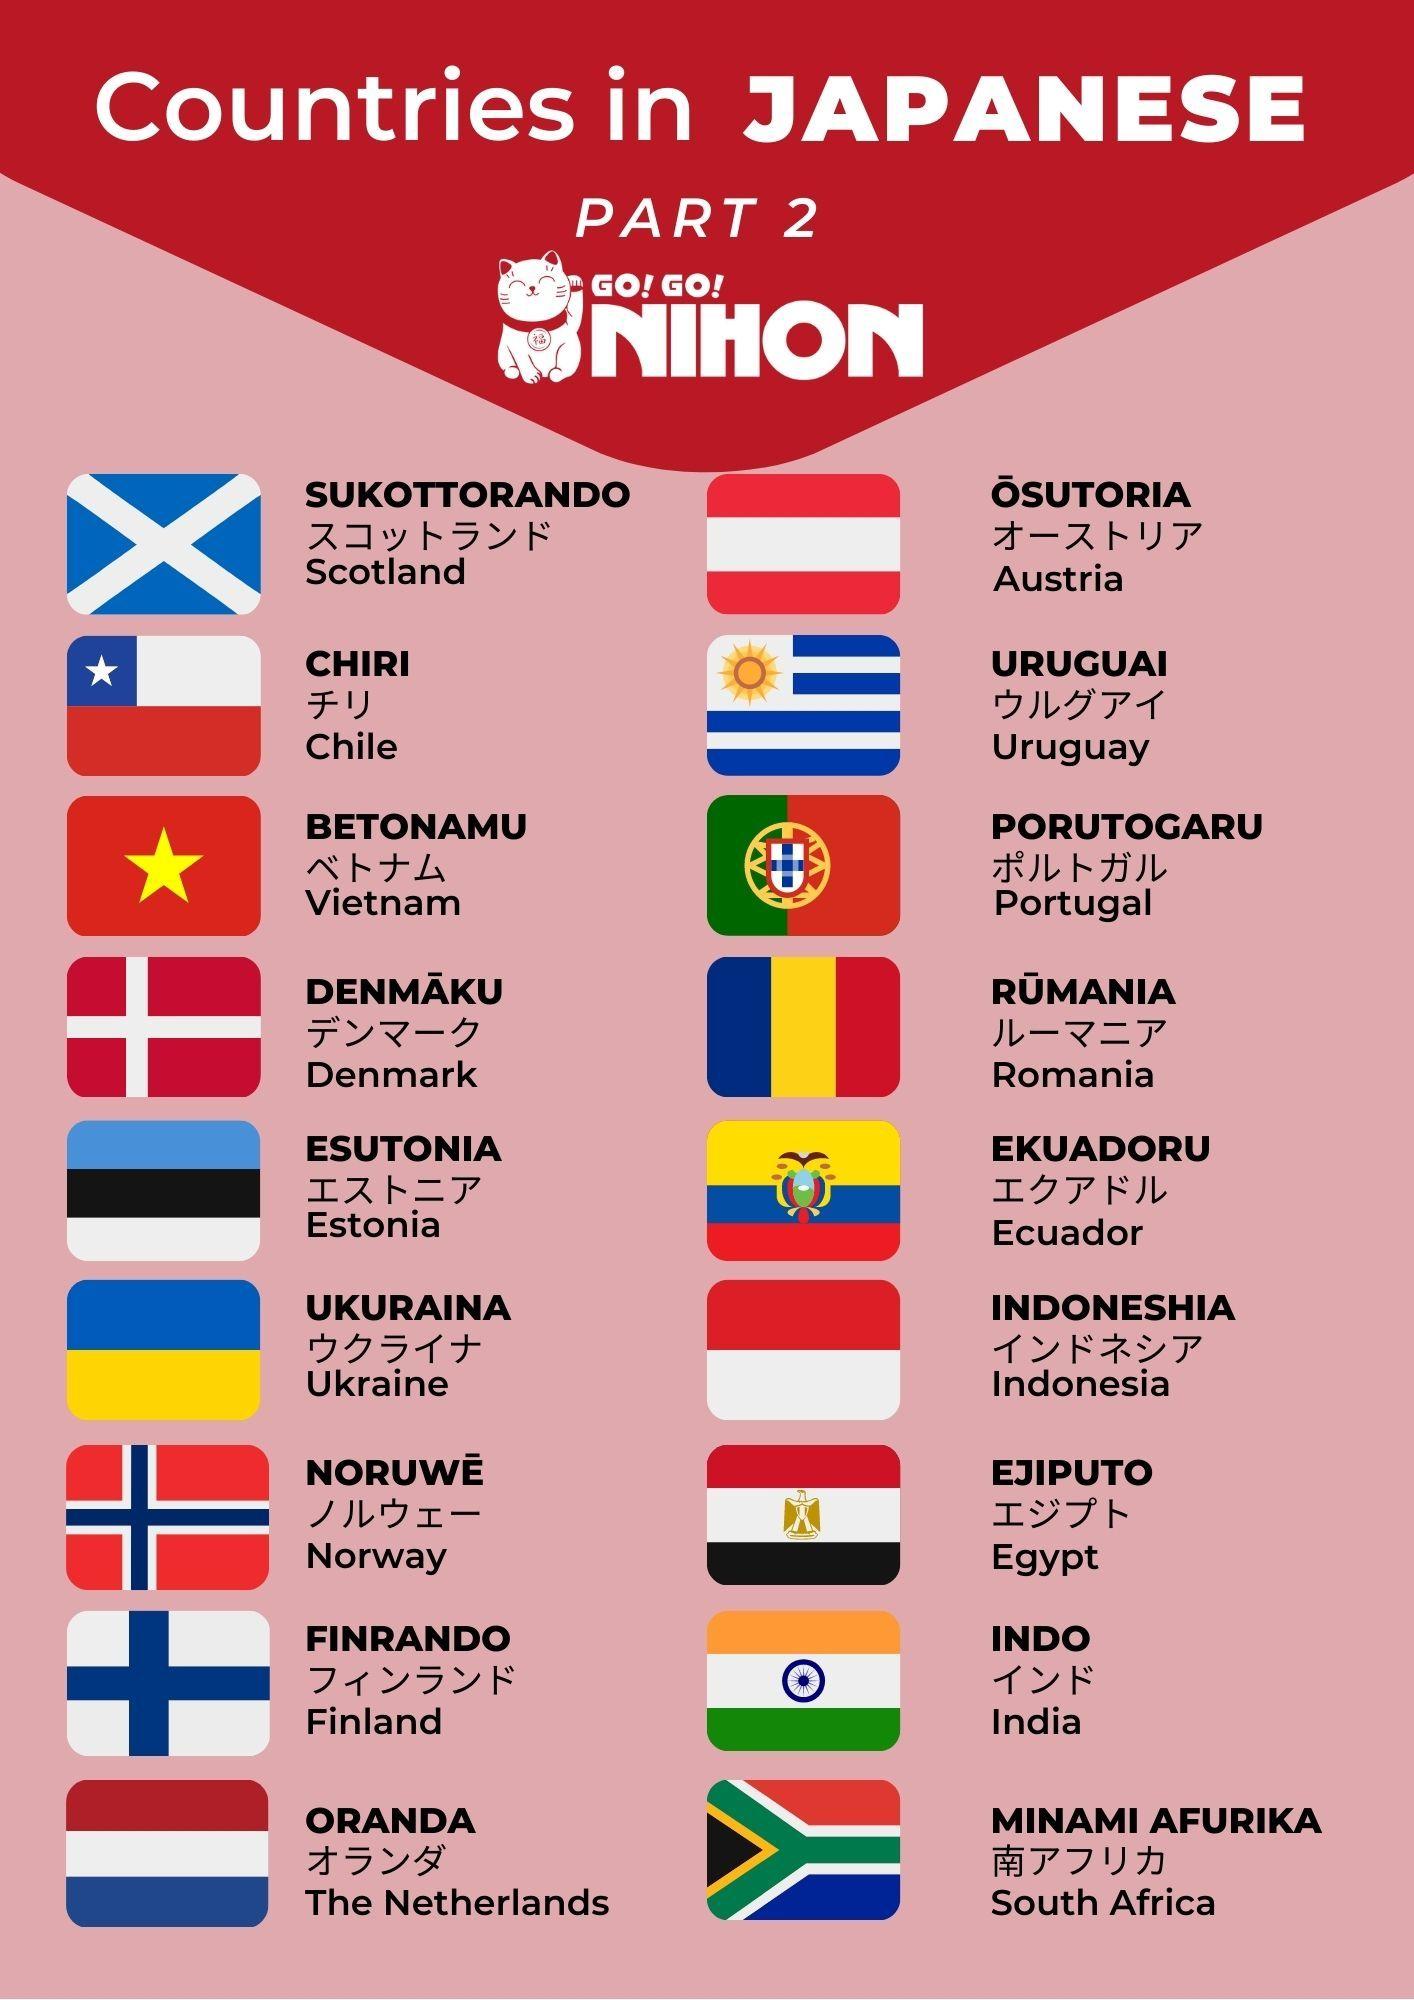 Countries In Japanese Japanese Language Learning Japanese Language Lessons Japanese Language